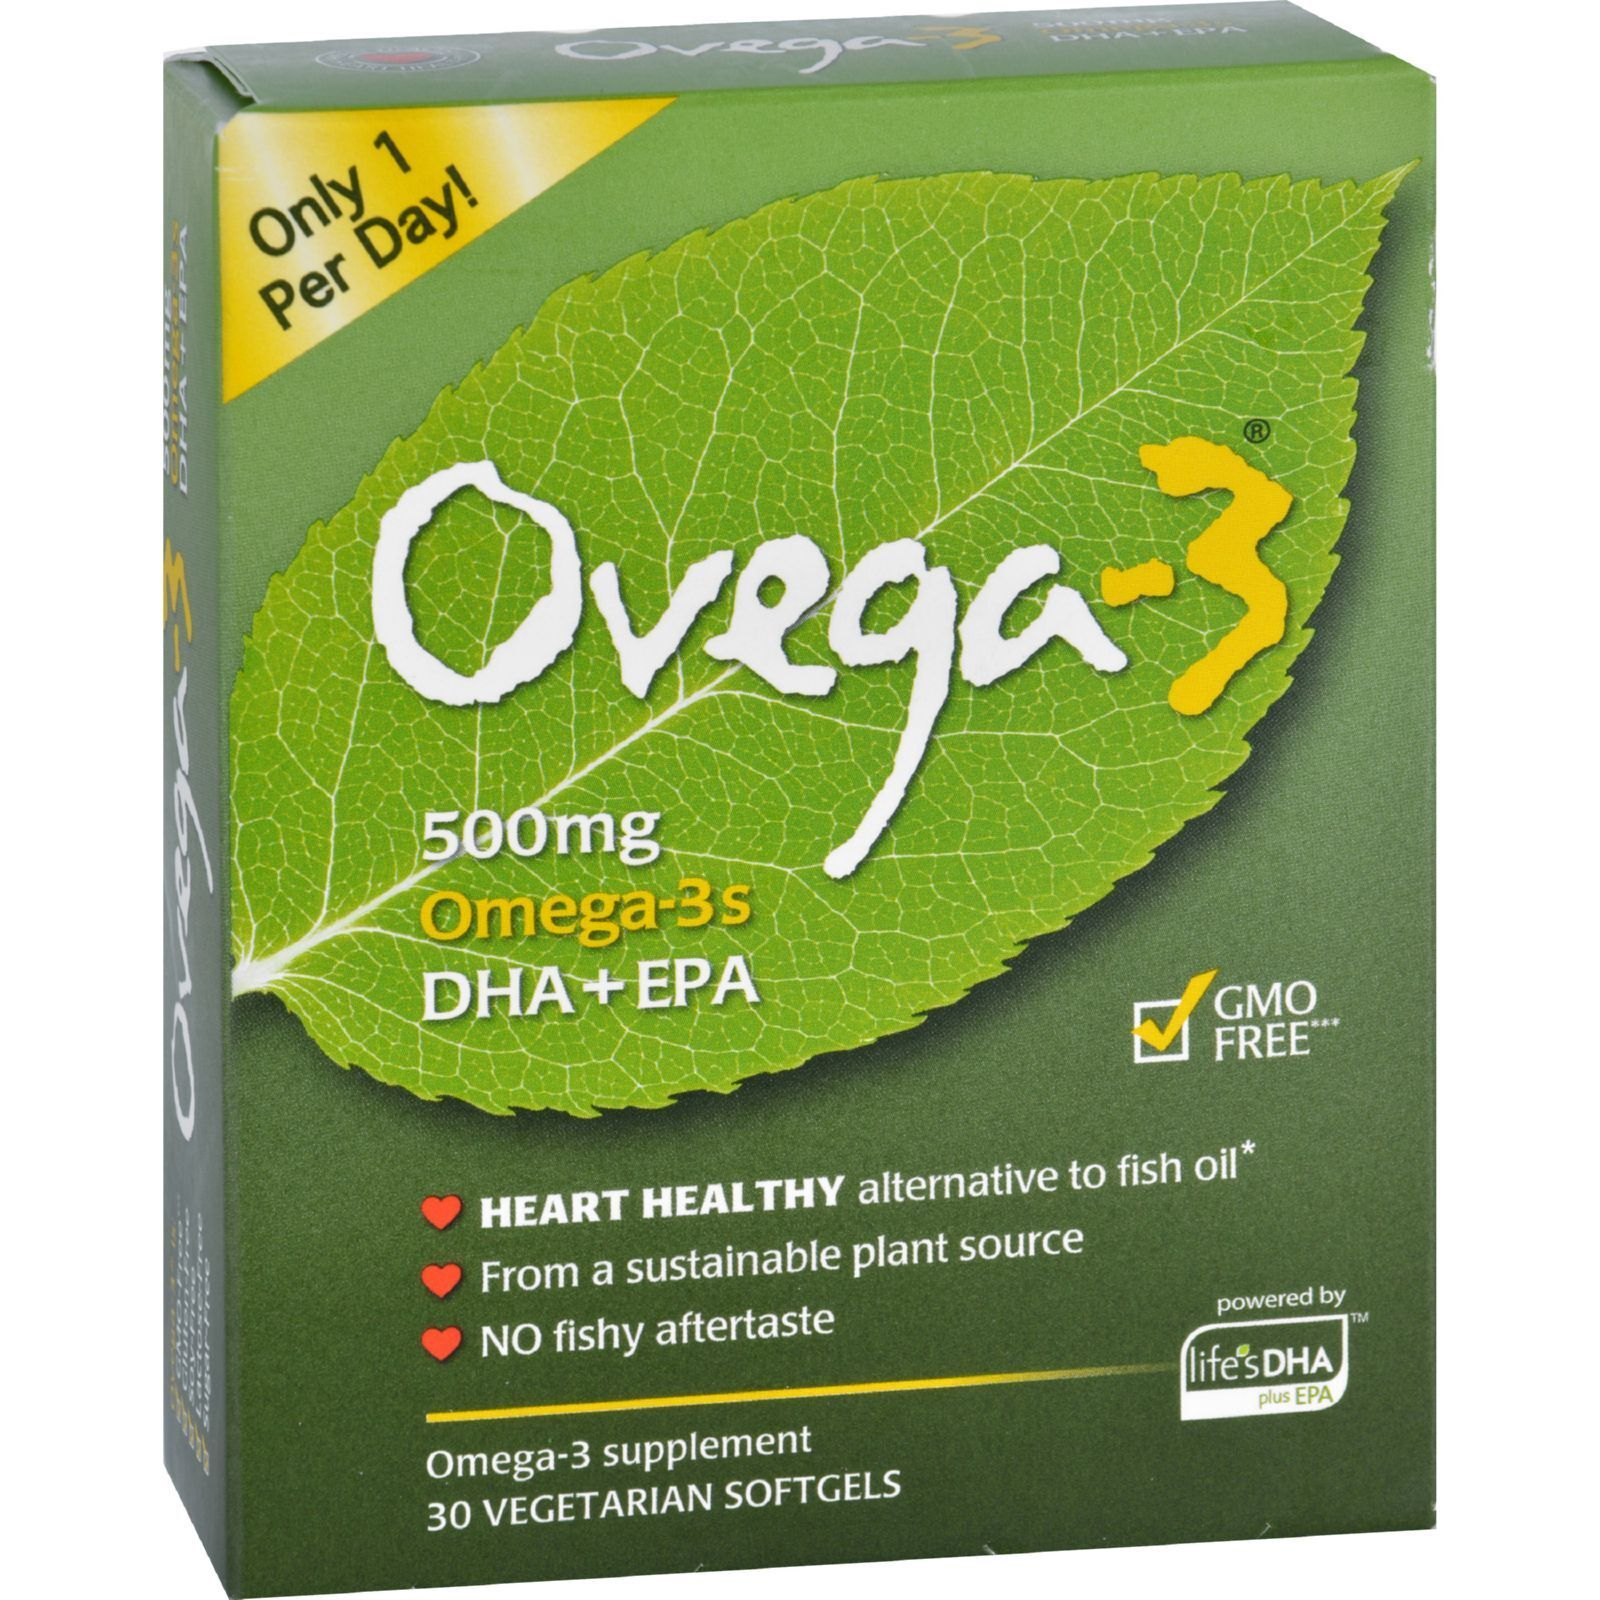 Watch Ovega-3 Vegetarian video